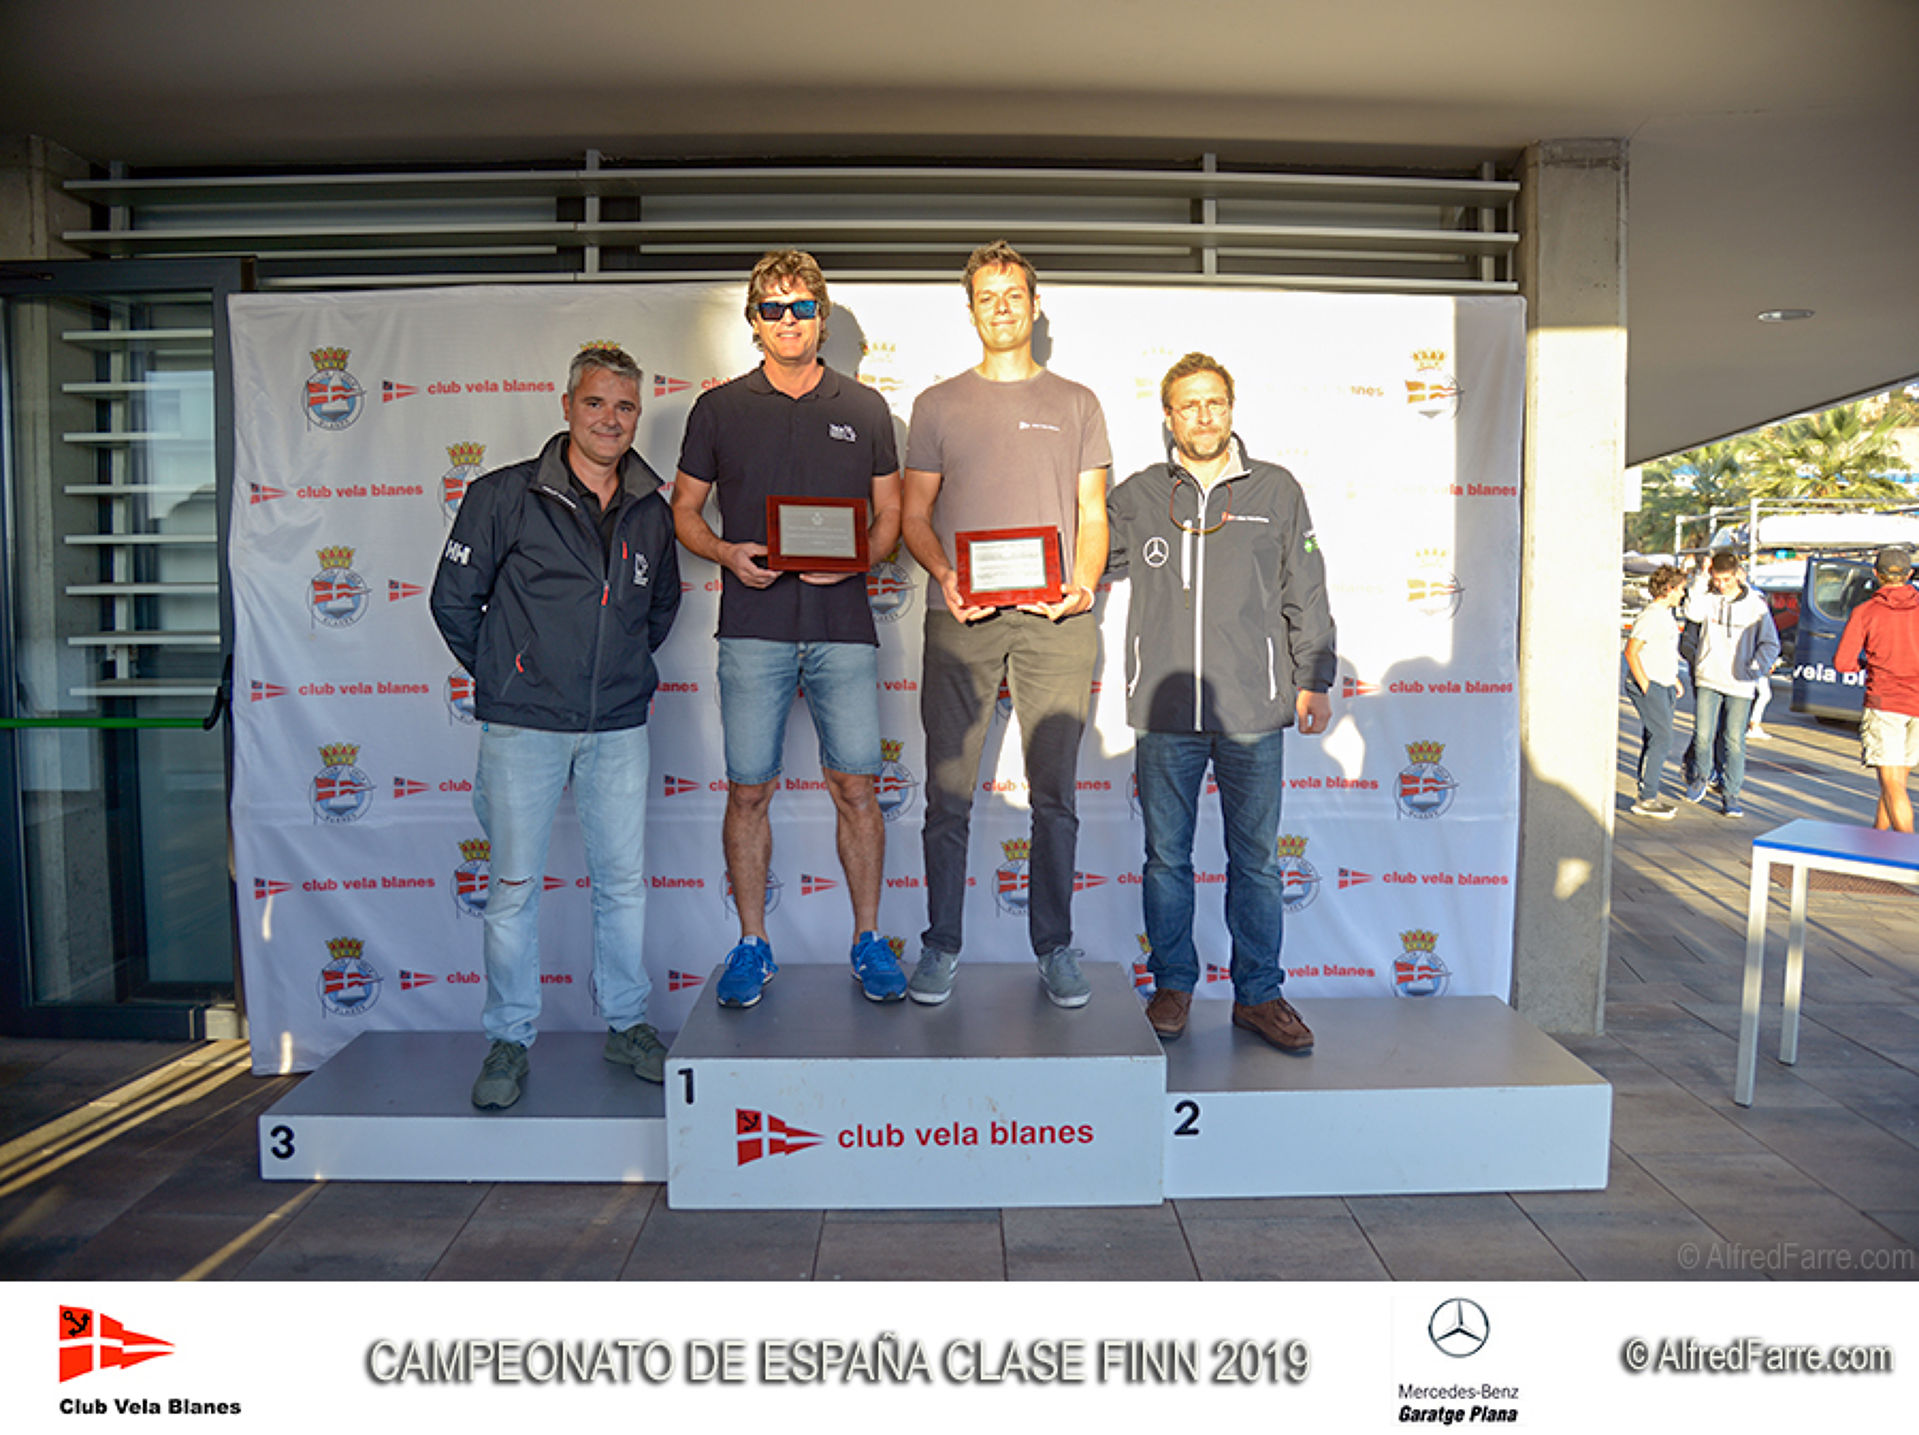 Carlos Ordóñez (Club Vela Blanes) Campeón de España de la clase Finn 2019